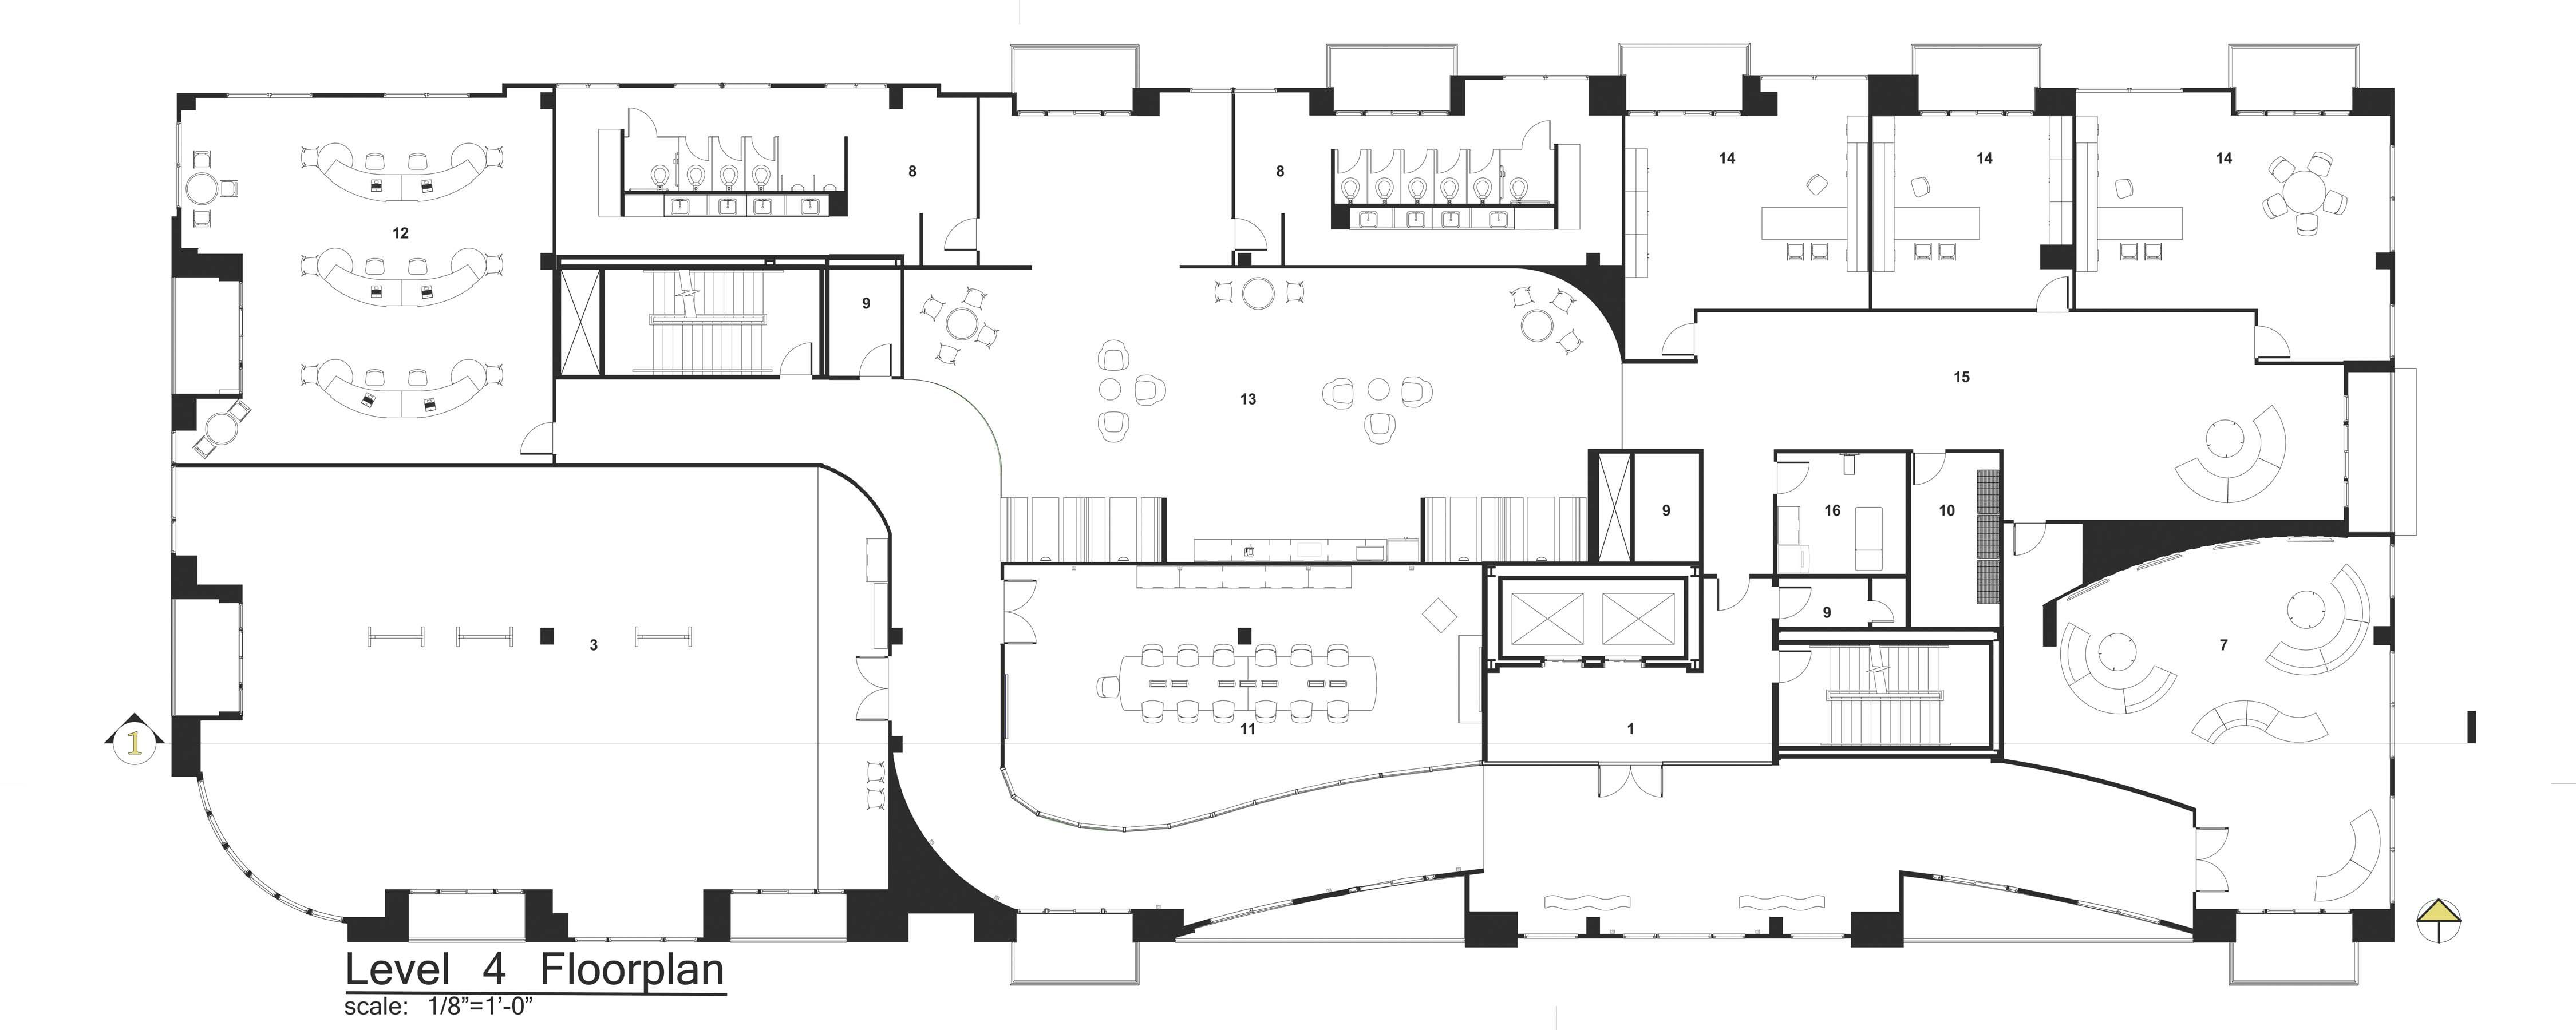 Lavish Retail Store Floor Plan Dwg Label Mobile Home Floor Plans How To Plan Floor Plans